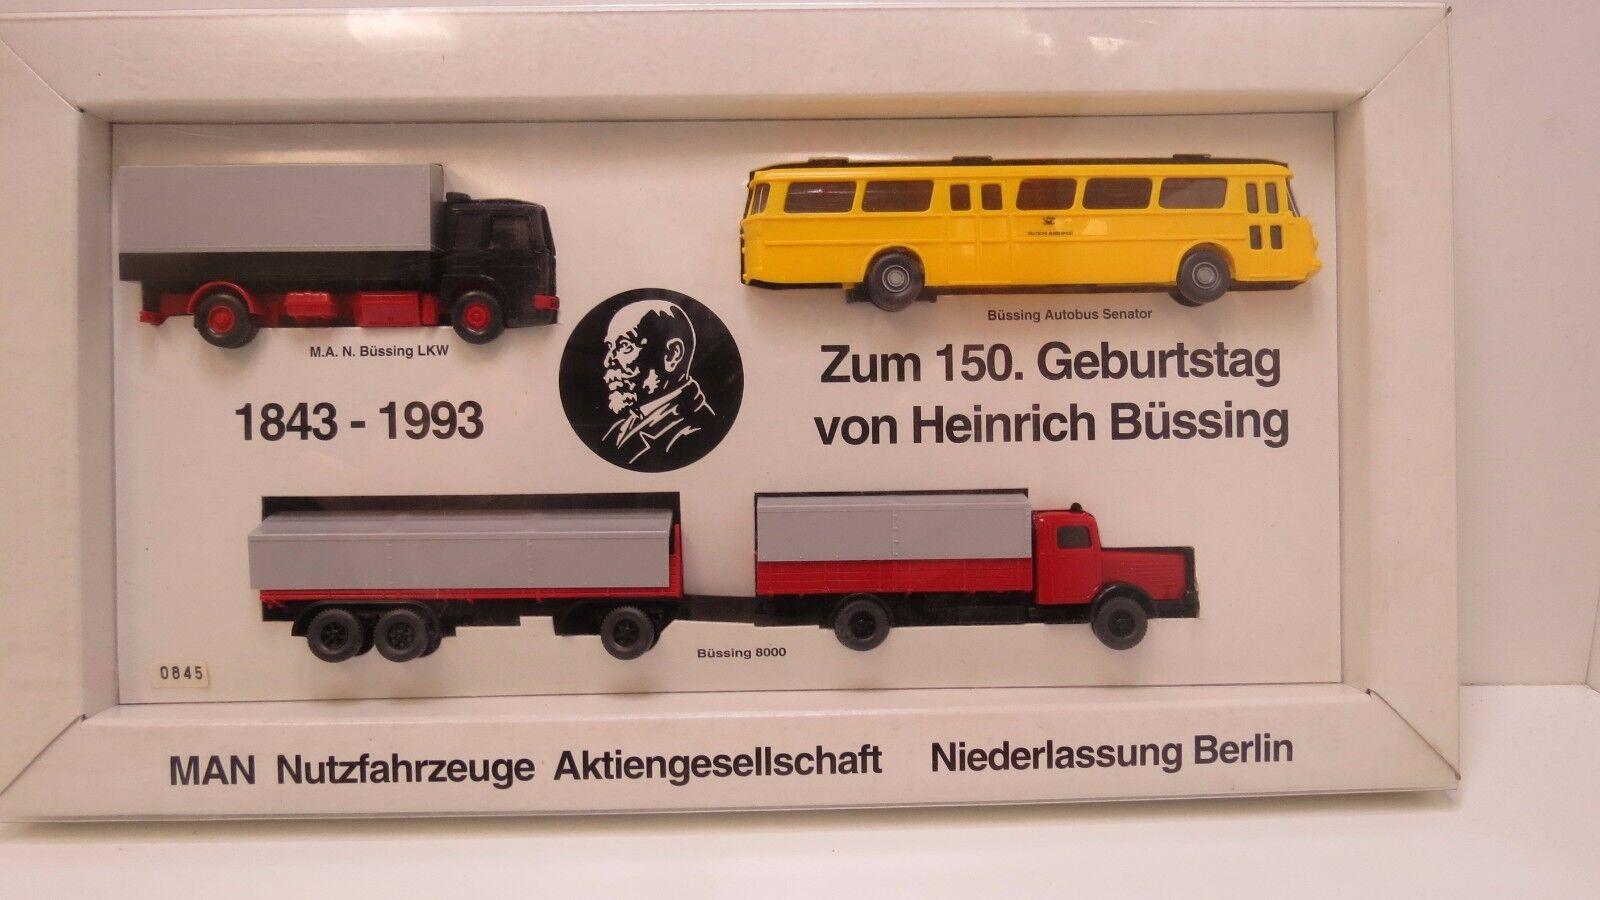 3 Camions Bus on 150 anniversaire Heinrich Büssing 1843-1993 Wiking 1: 87 Neuf dans sa boîte | Facile à Nettoyer Surface